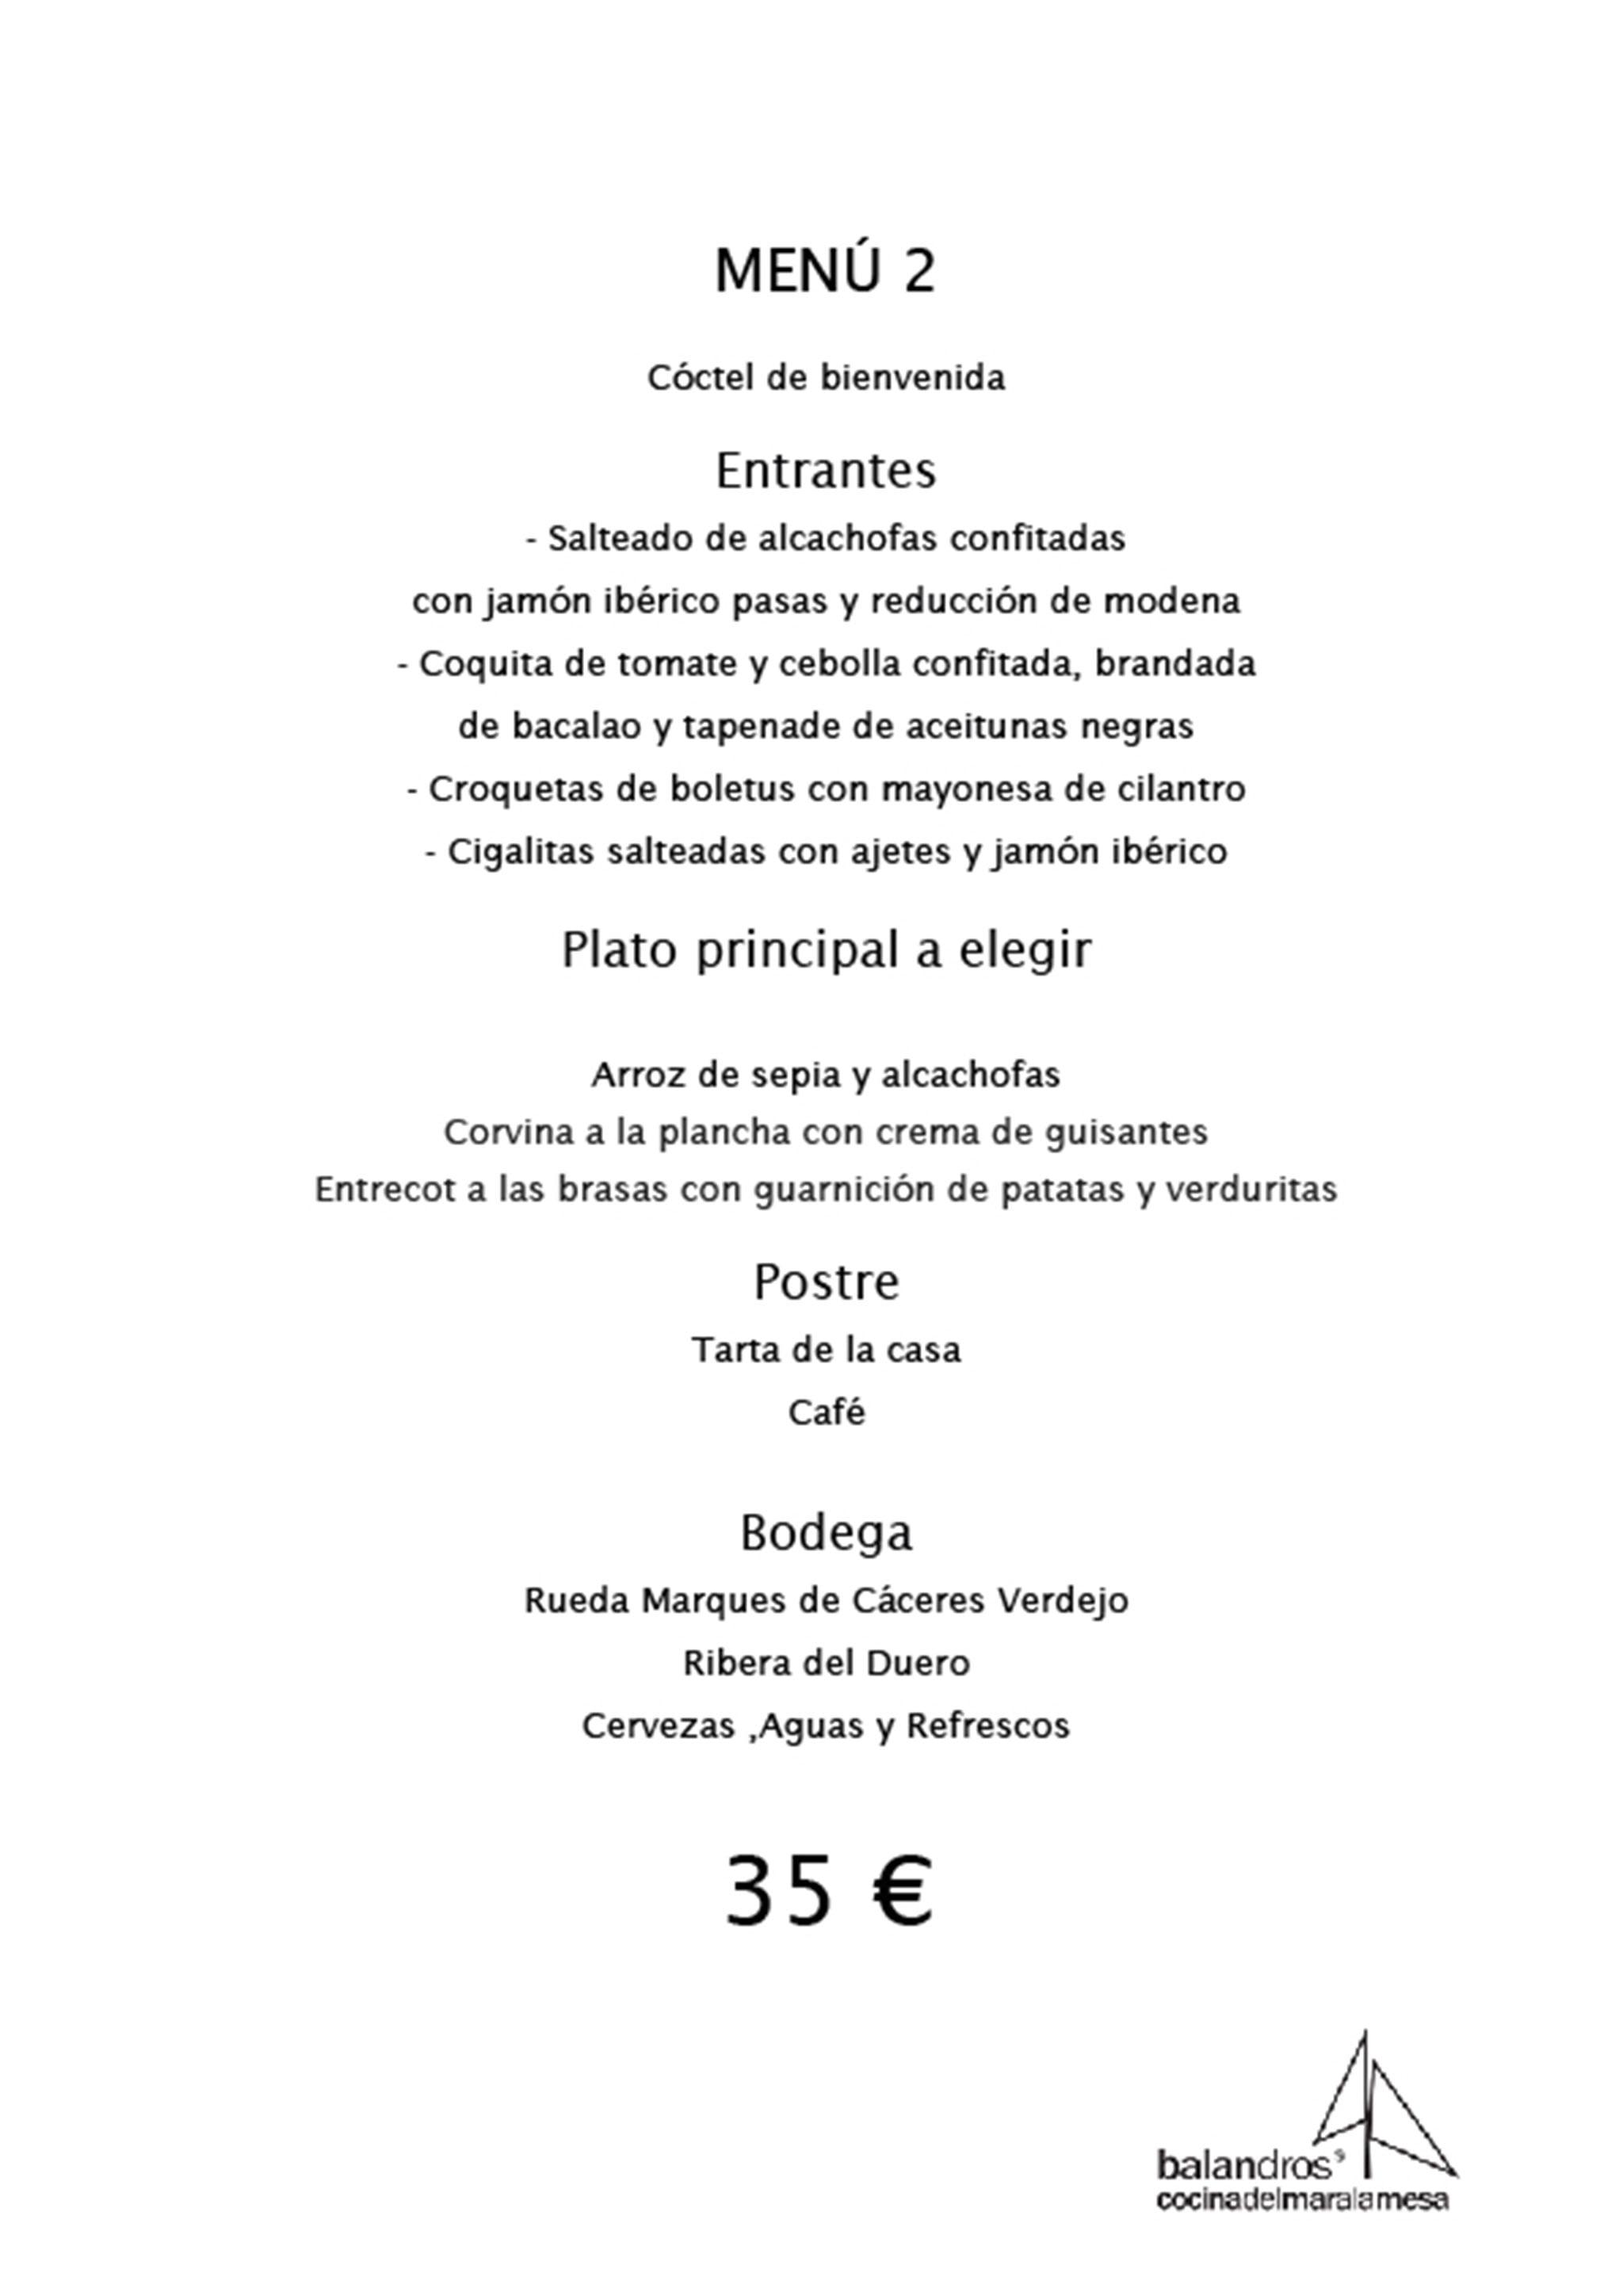 Menú de empresa por 35€ – Restaurante Balandros